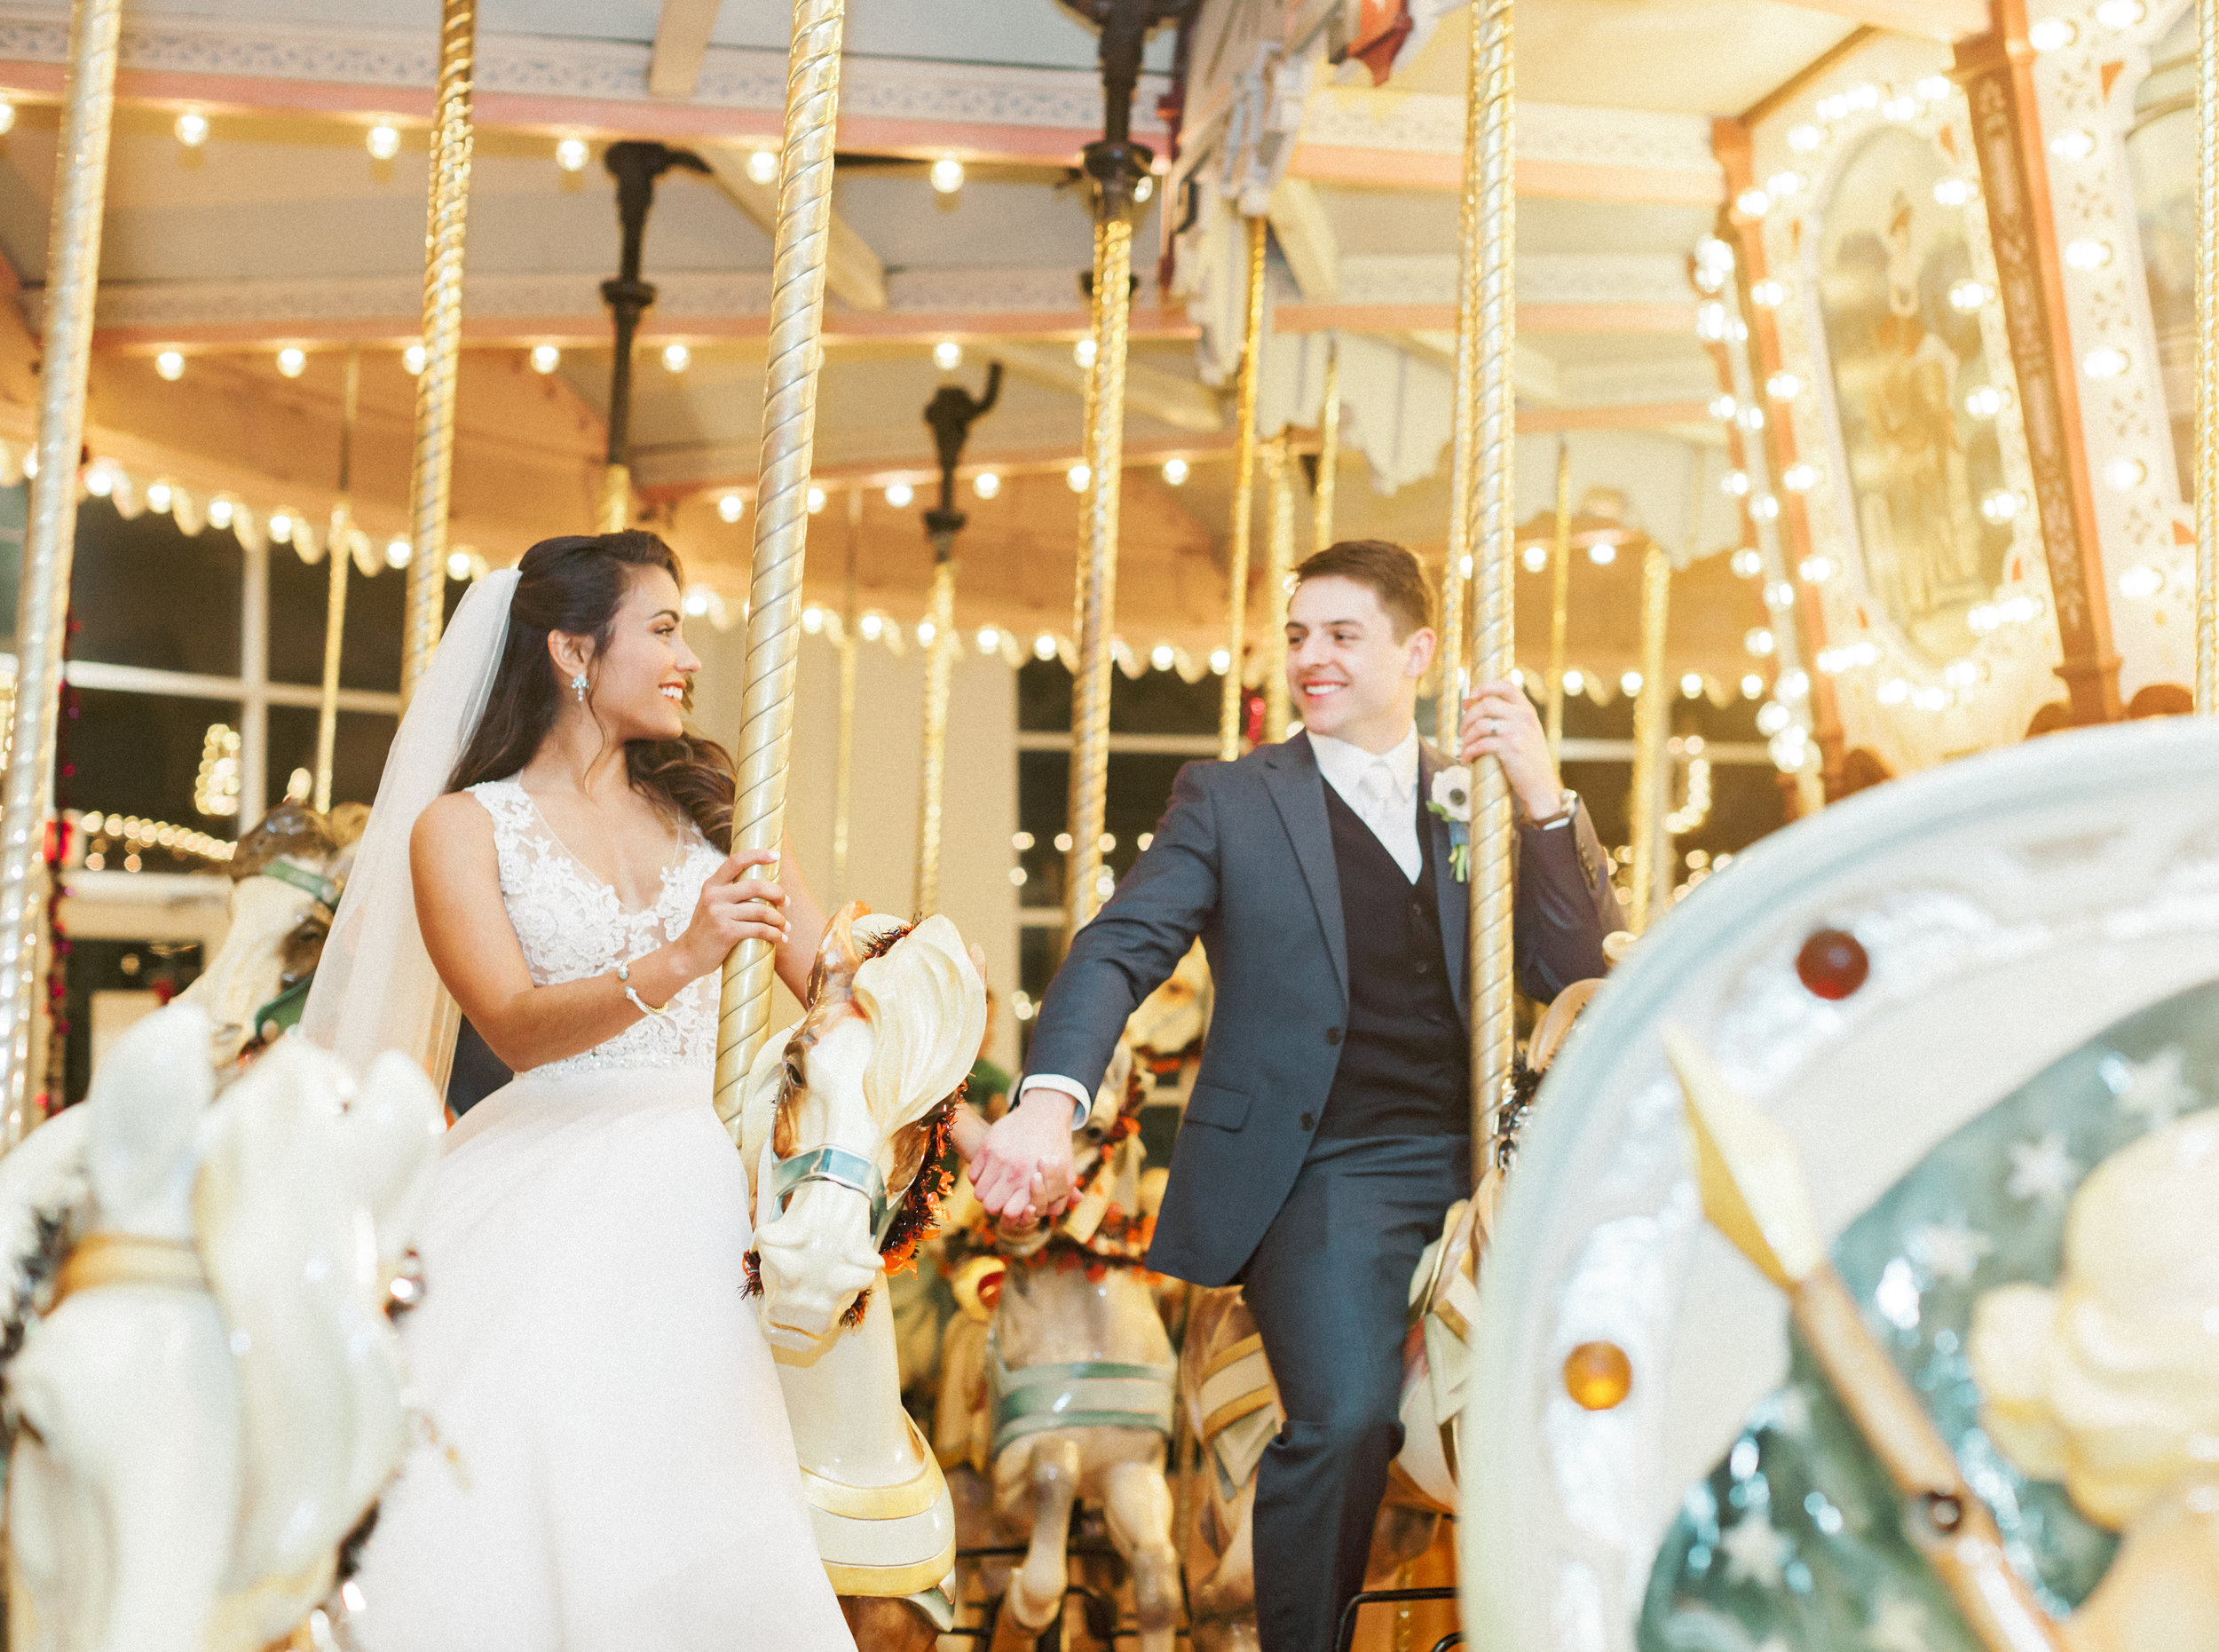 VALERIA & JARRET WEDDING - The Historic Post Office Hampton, VA